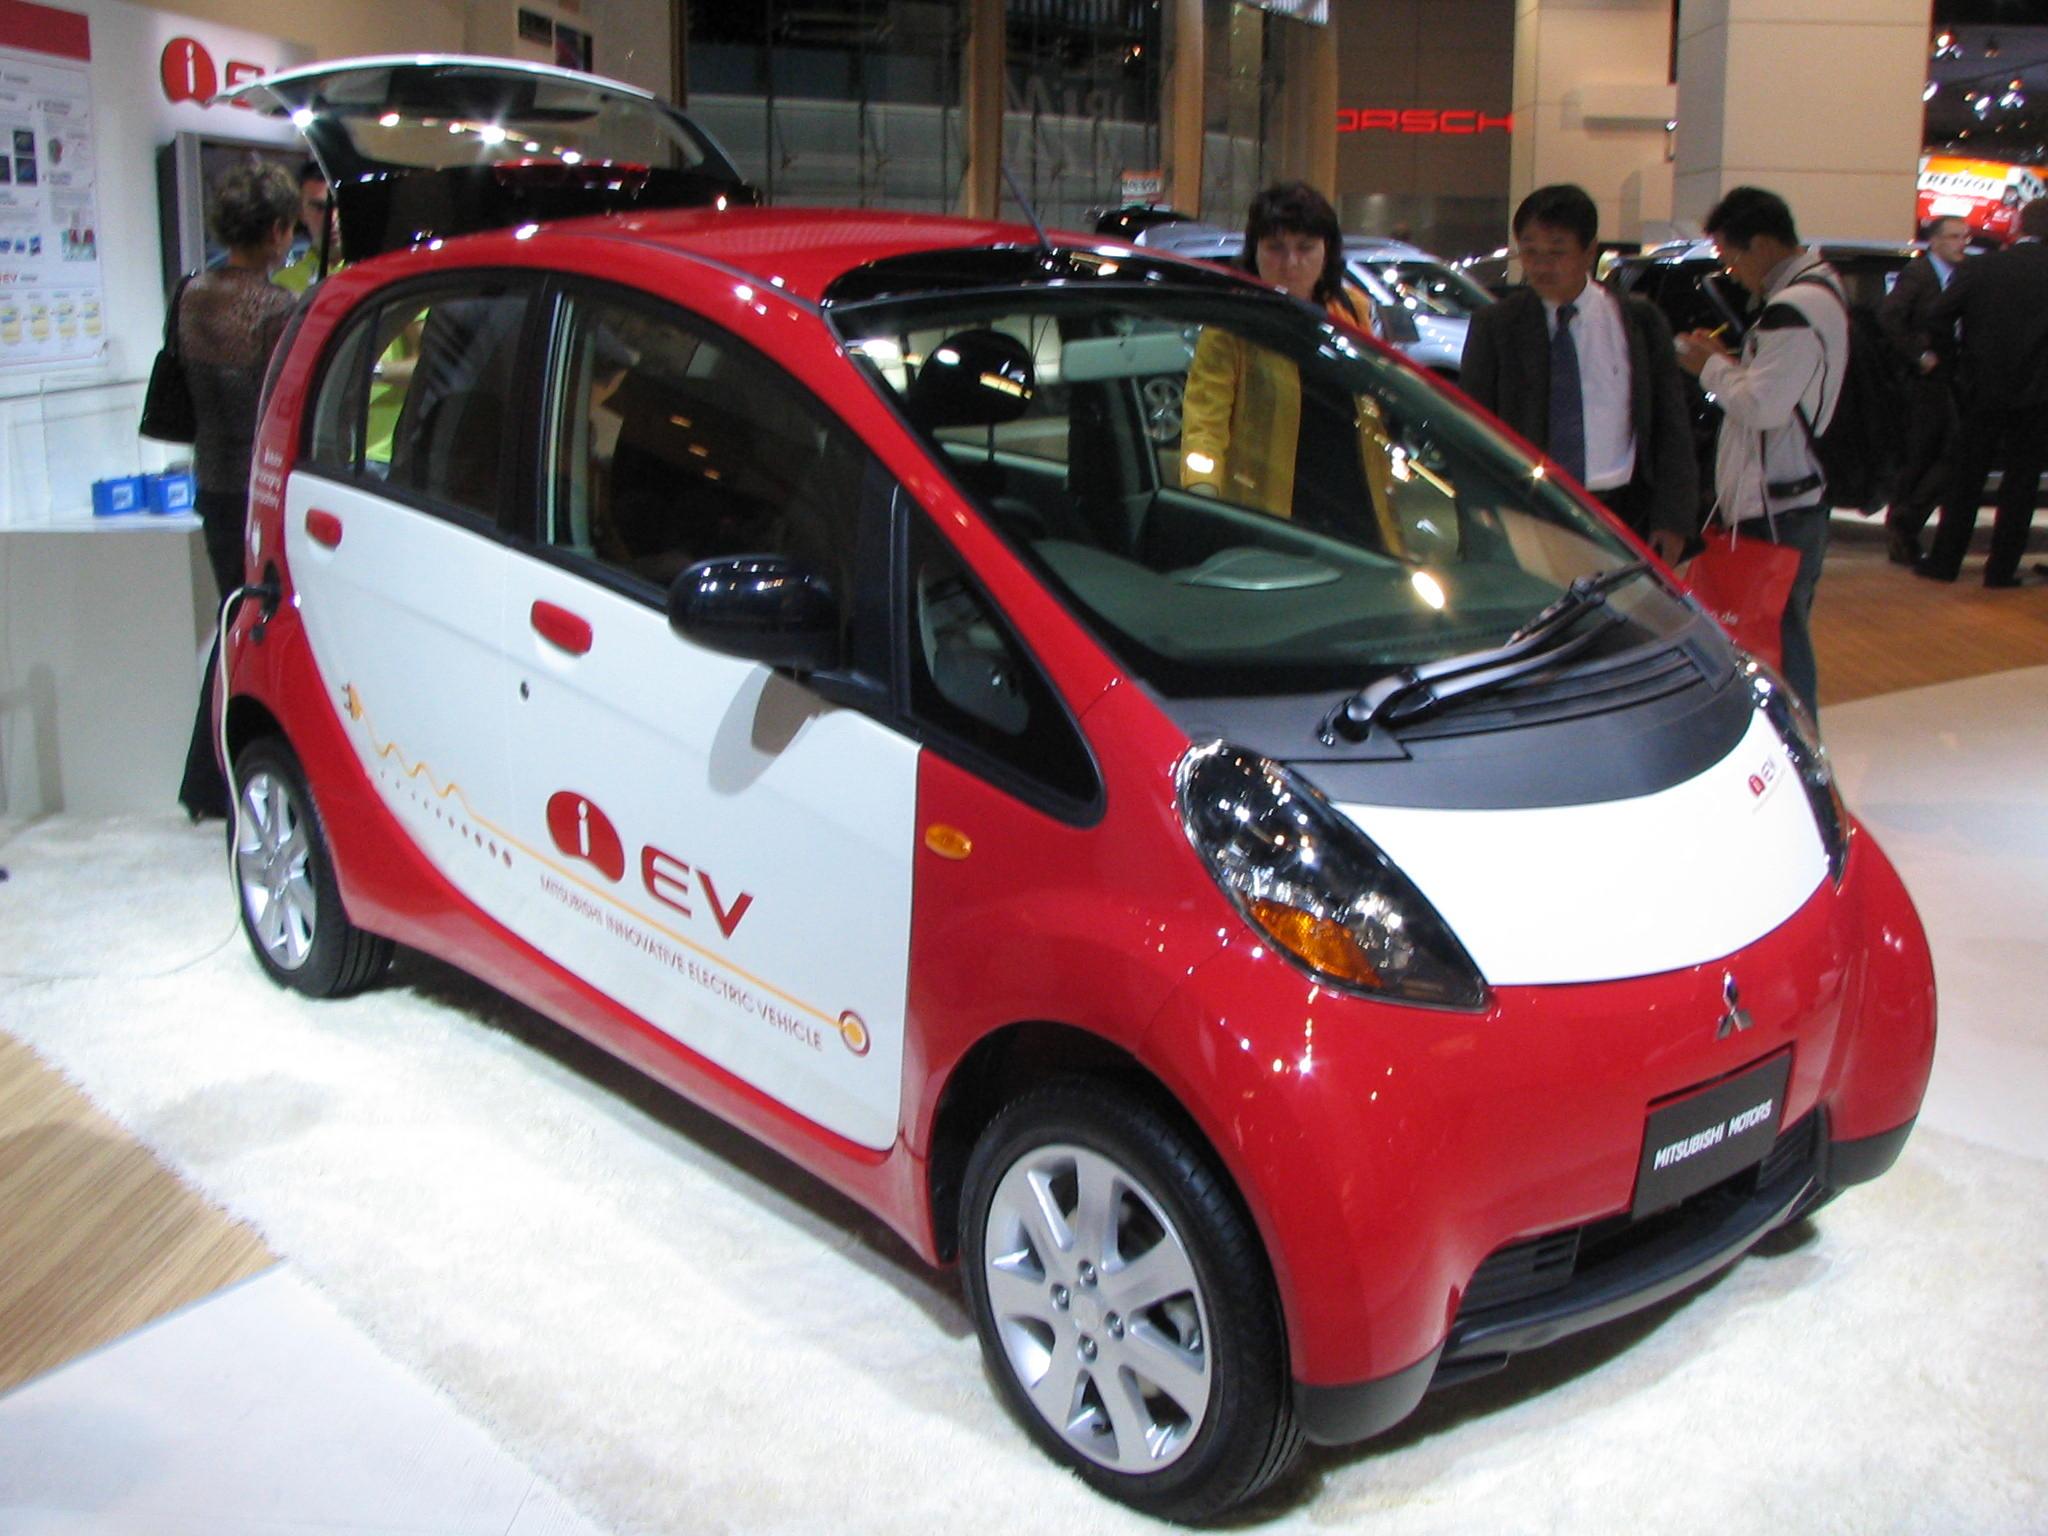 Mitsubishi electric car iEV